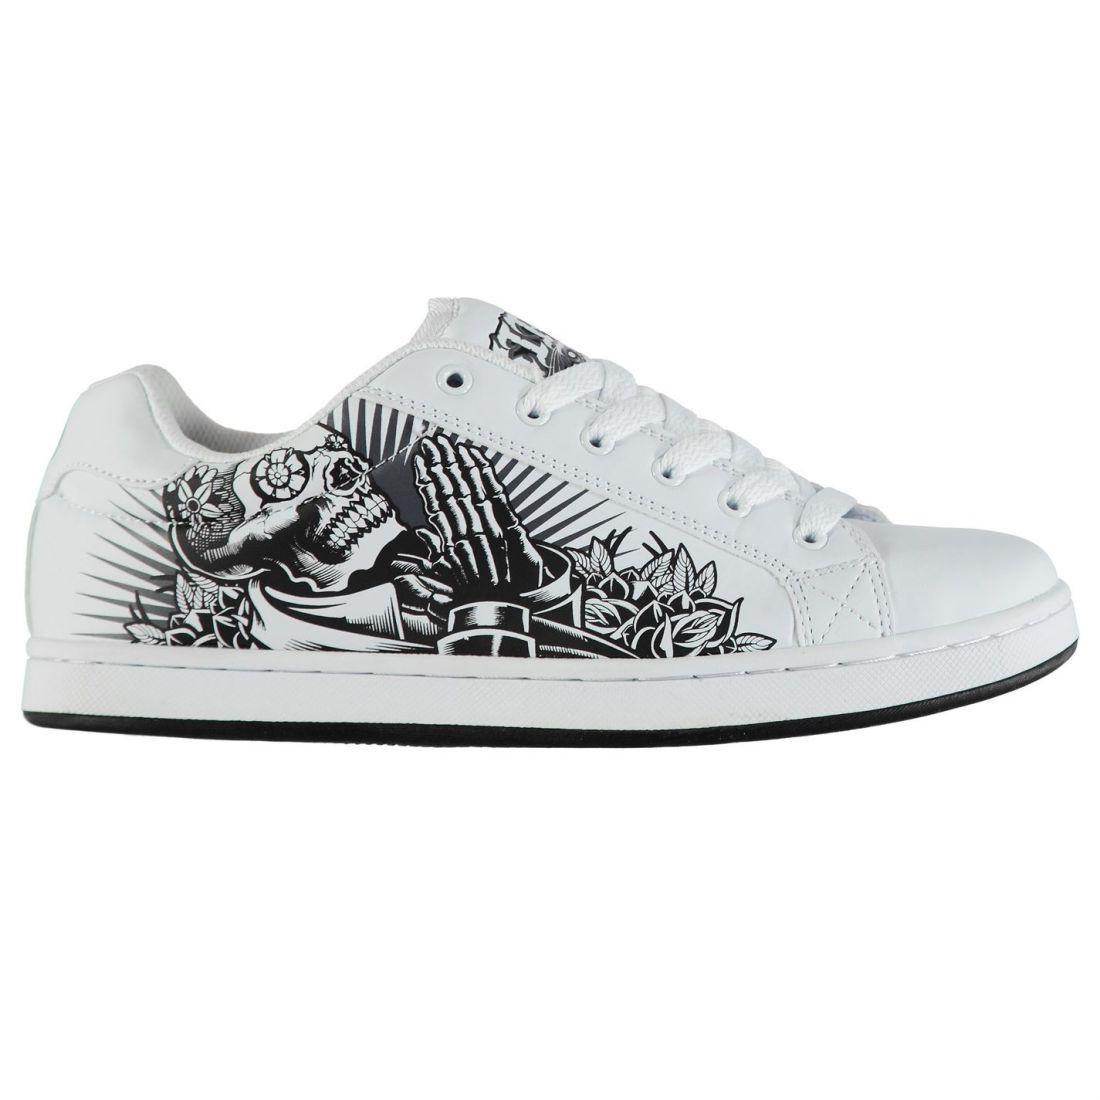 94325de63323 Osiris Troma Redux Sneakers Mens Gents Skate Shoes Laces Fastened ...